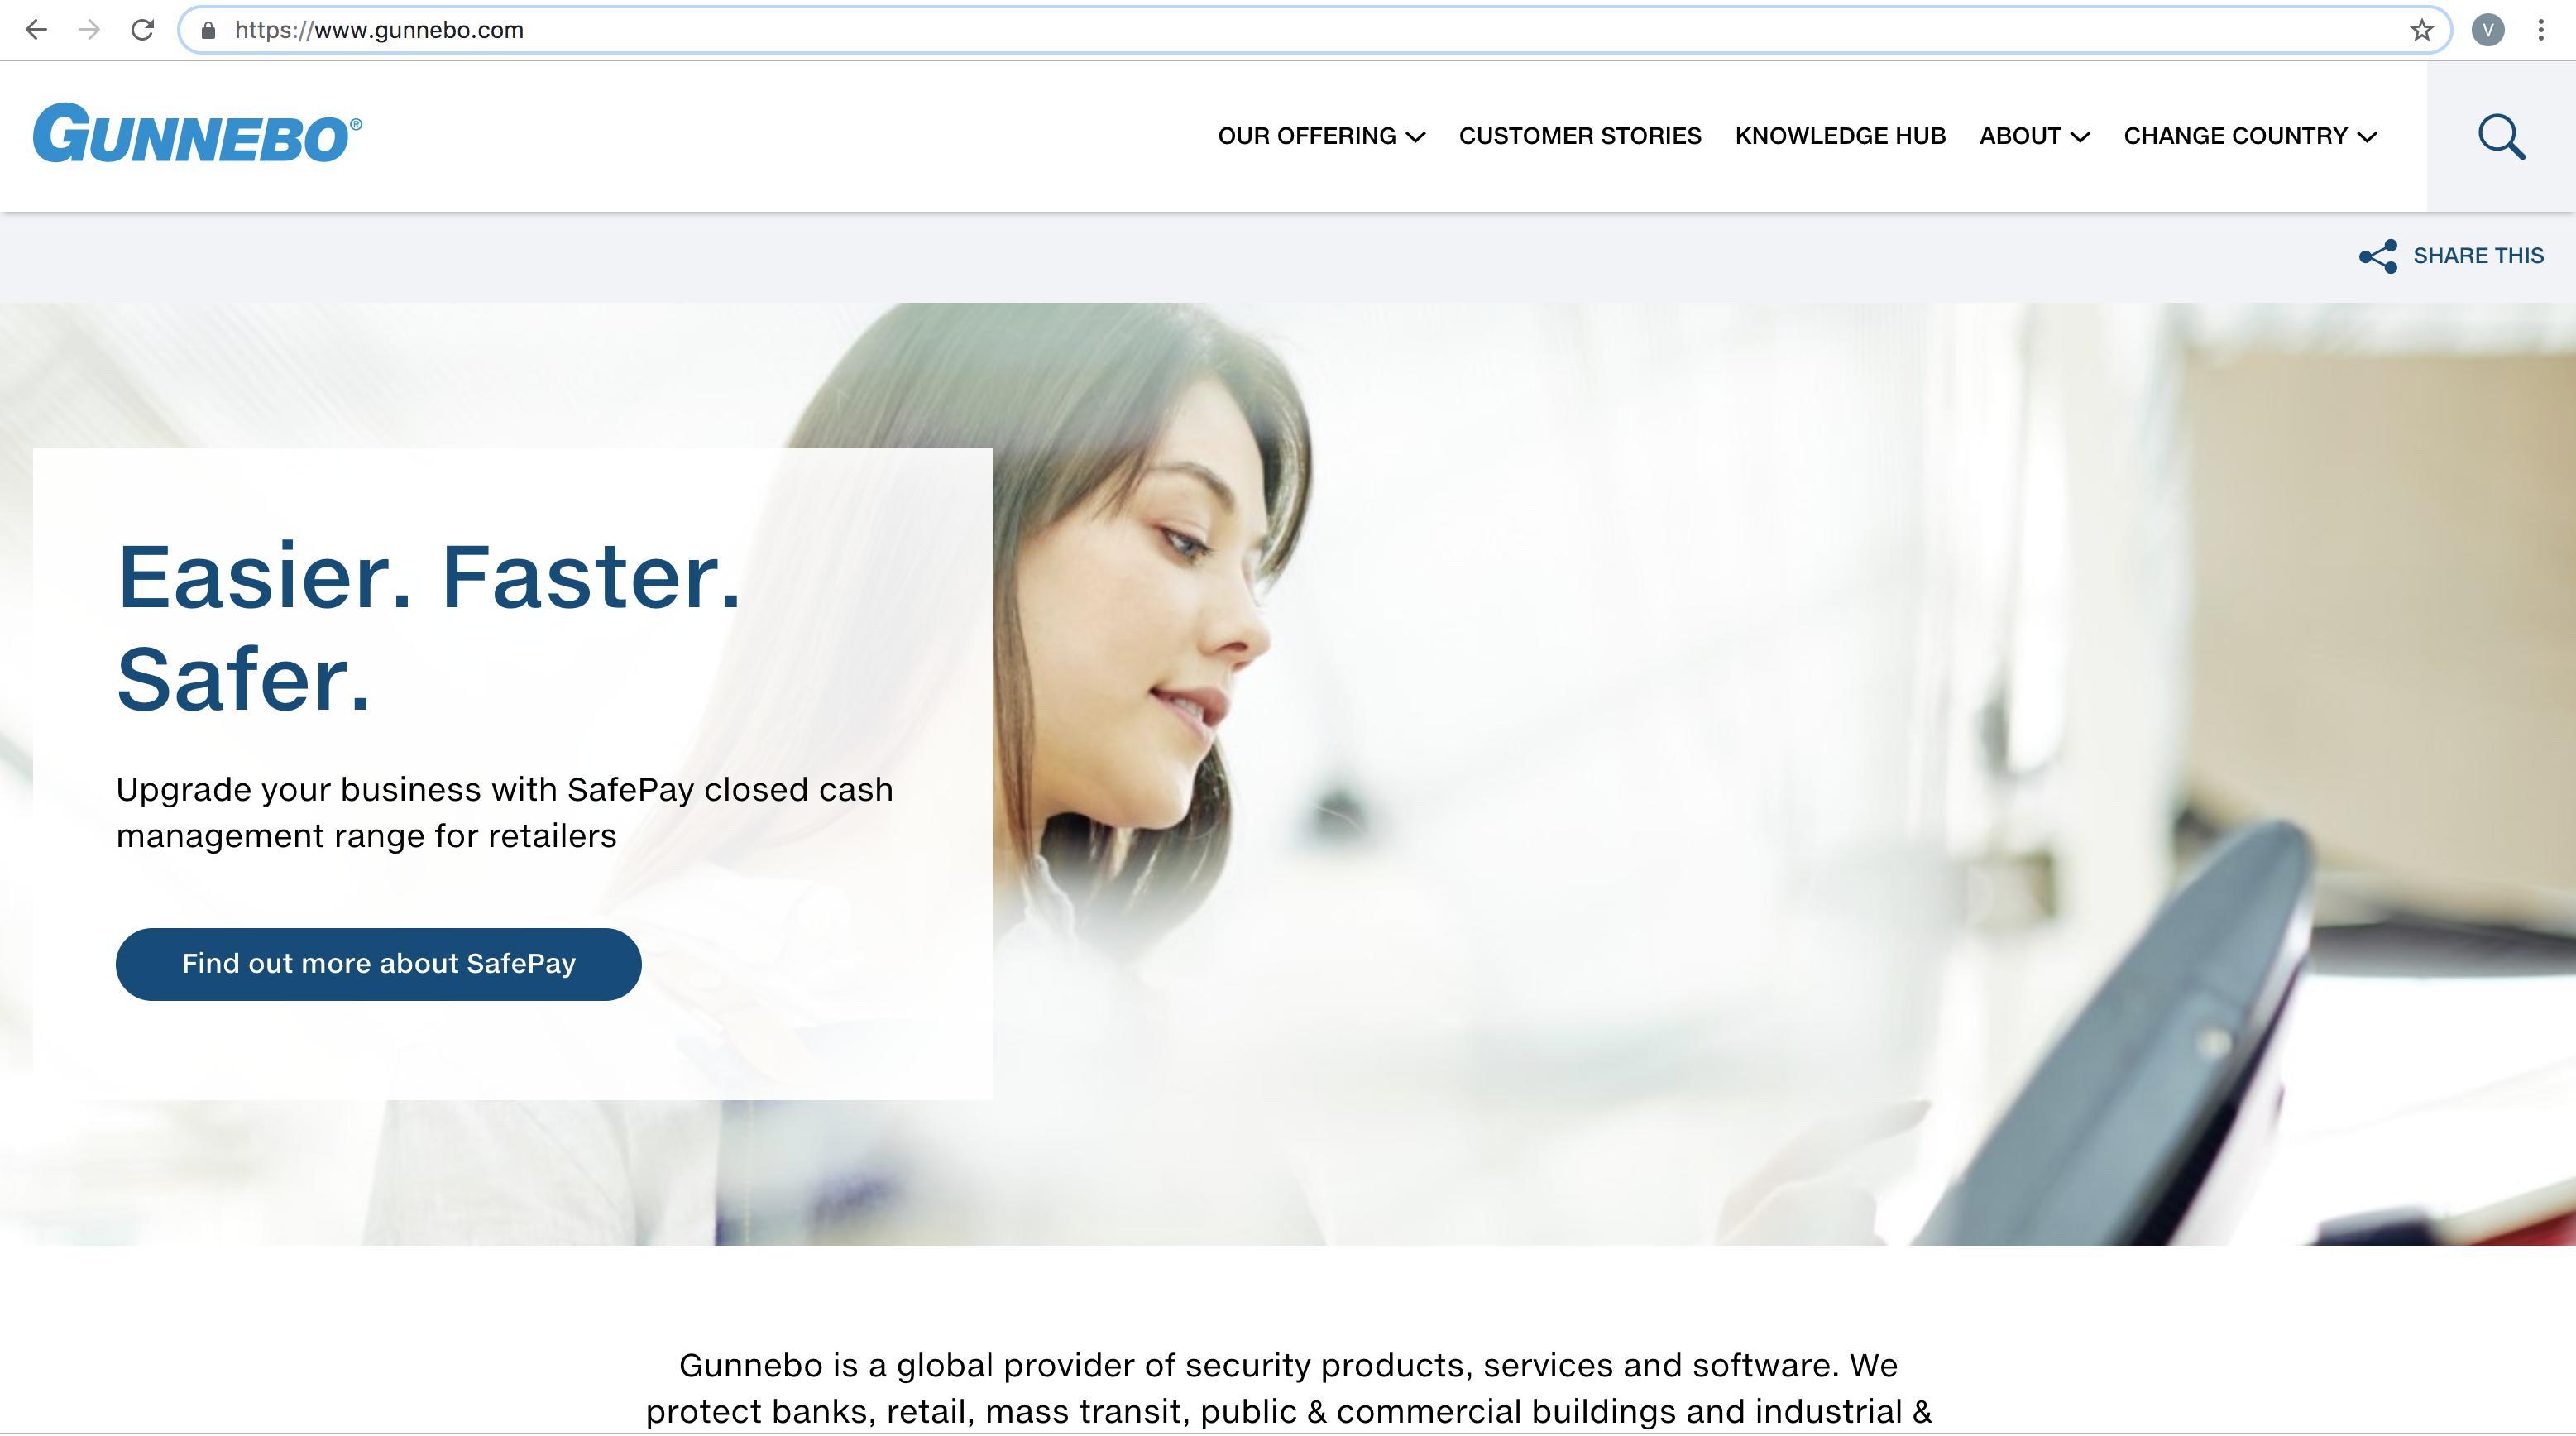 Gunnebo-website-screenshot